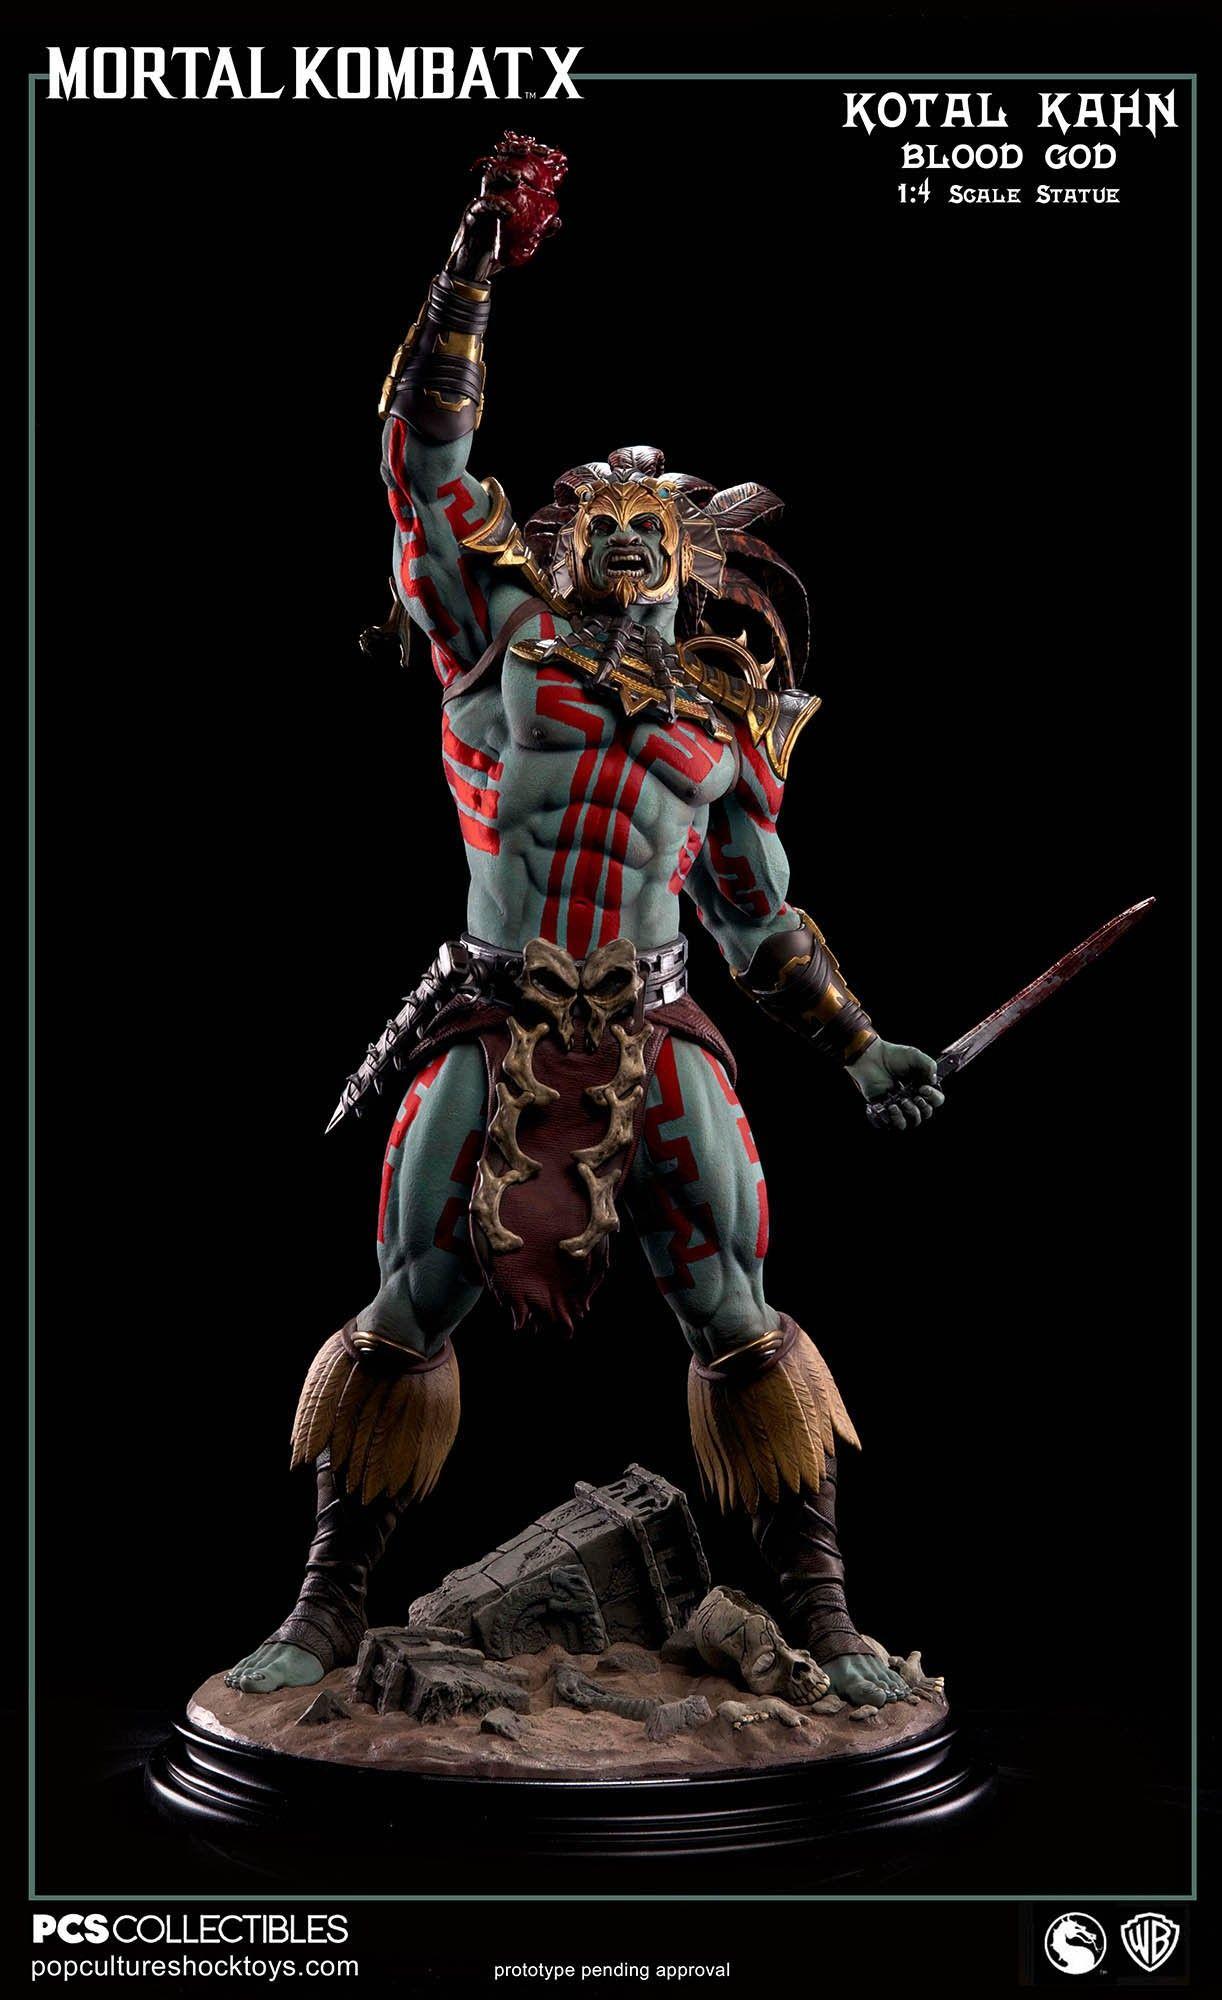 Download Wallpaper x Kotal kahn Mortal kombat x Oshtekk